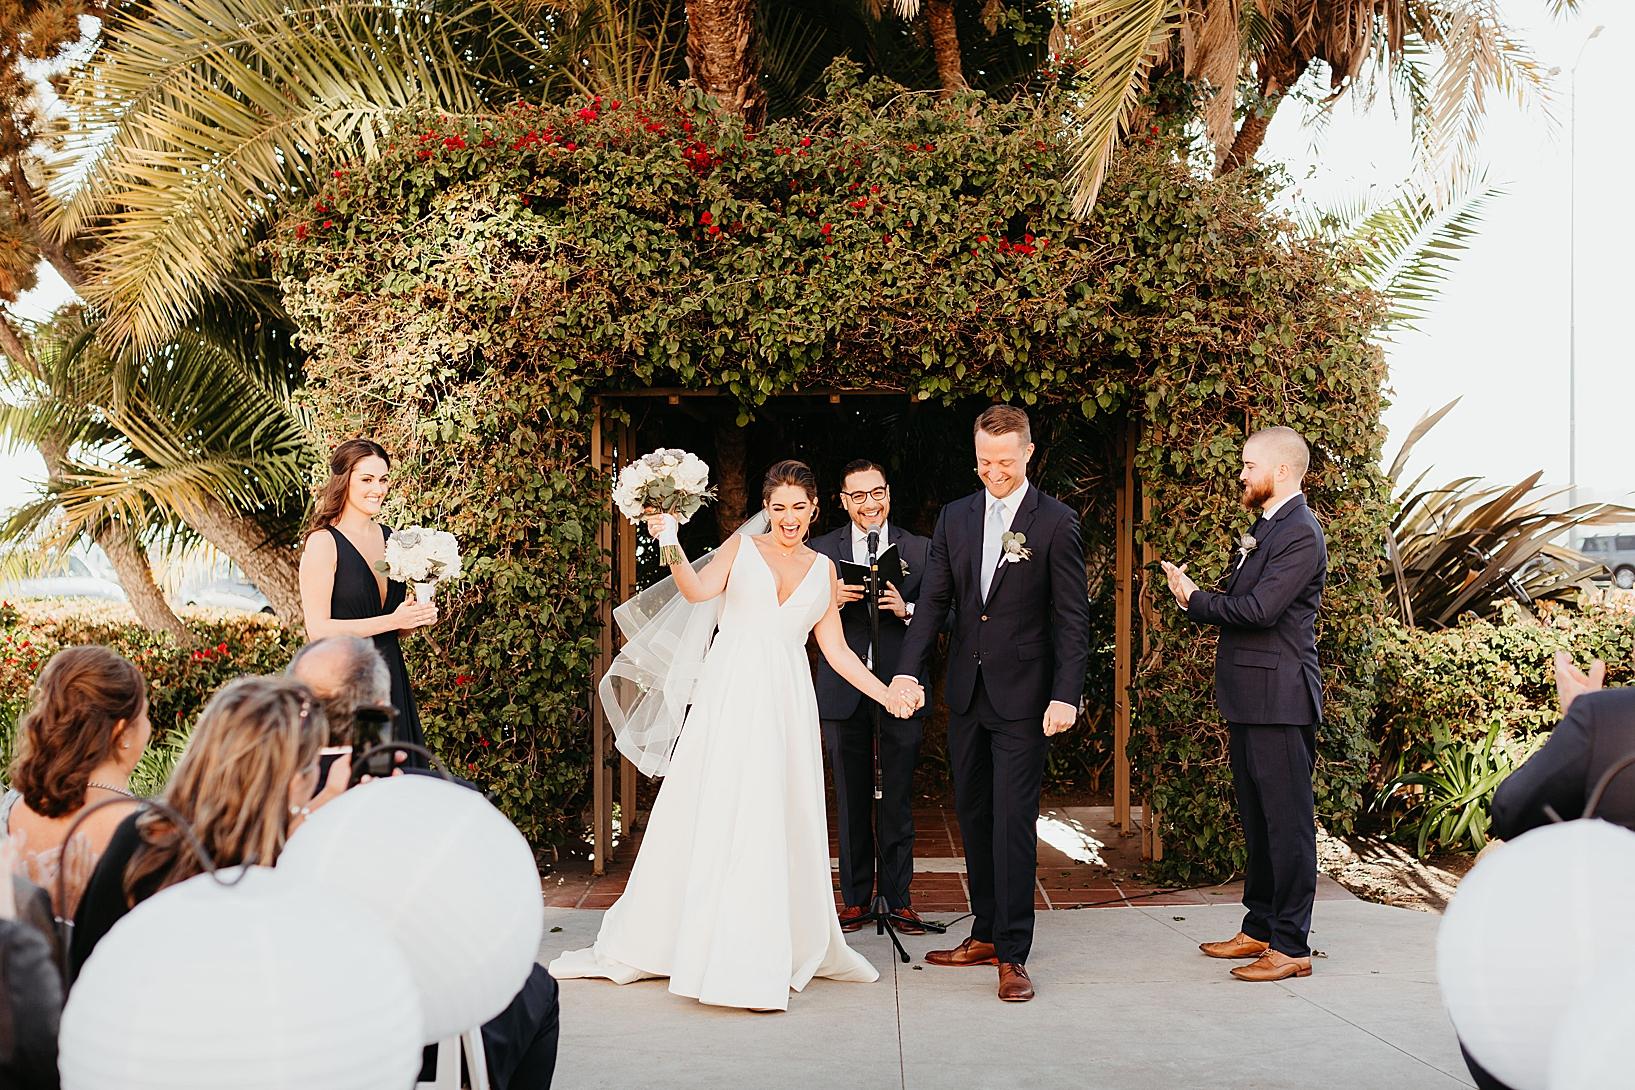 Herb-and-Wood-Wedding-44.jpg